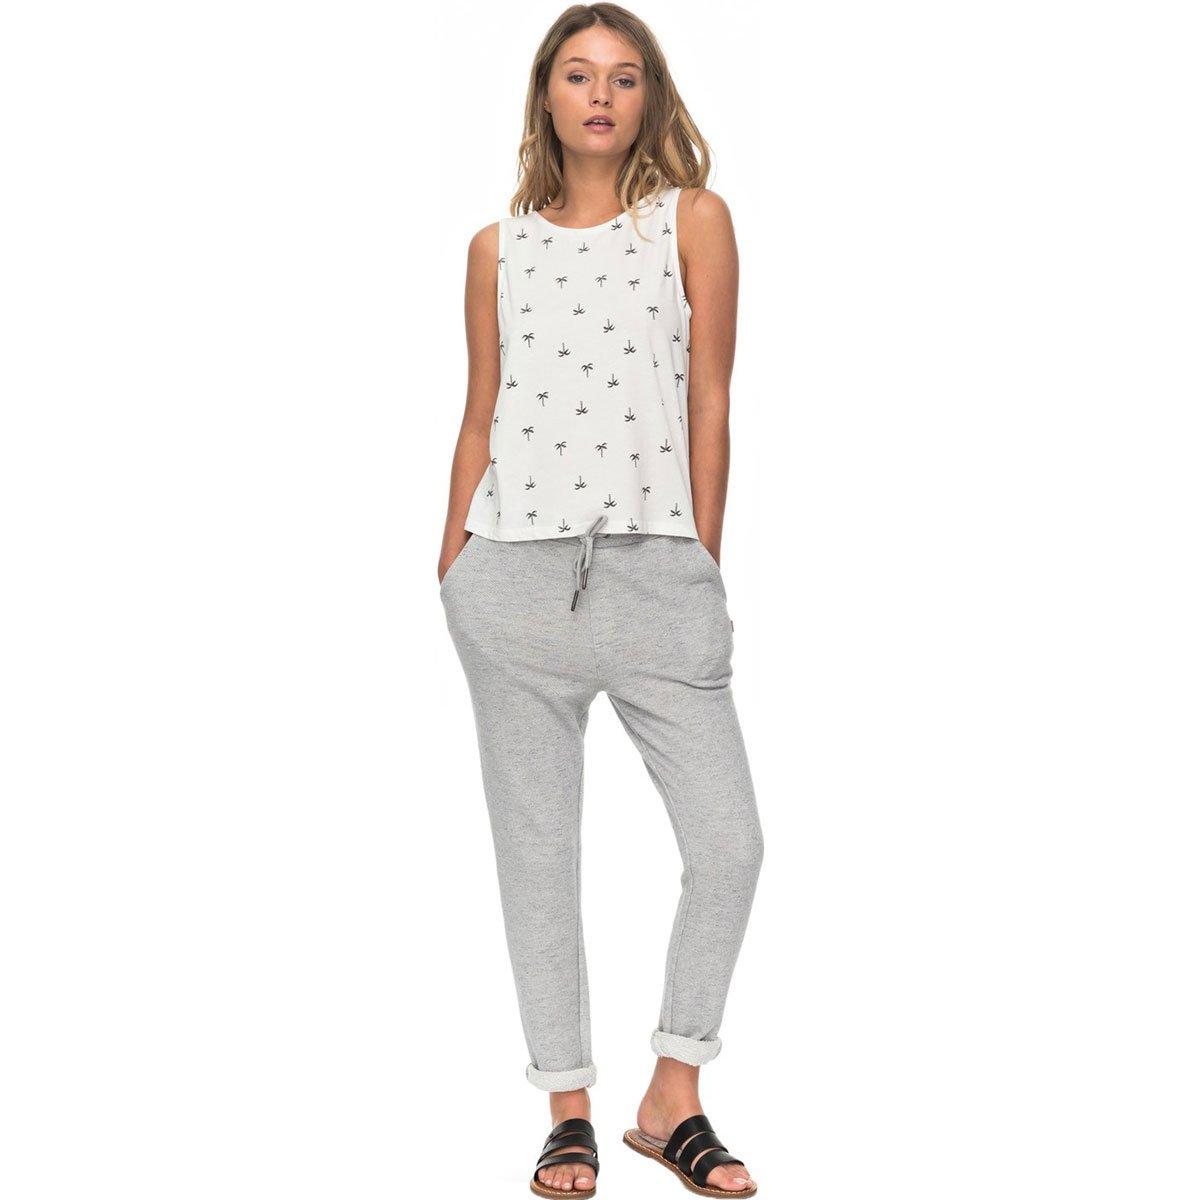 Roxy Women's Trippin Joggers Pants,Medium,Heritage Heather